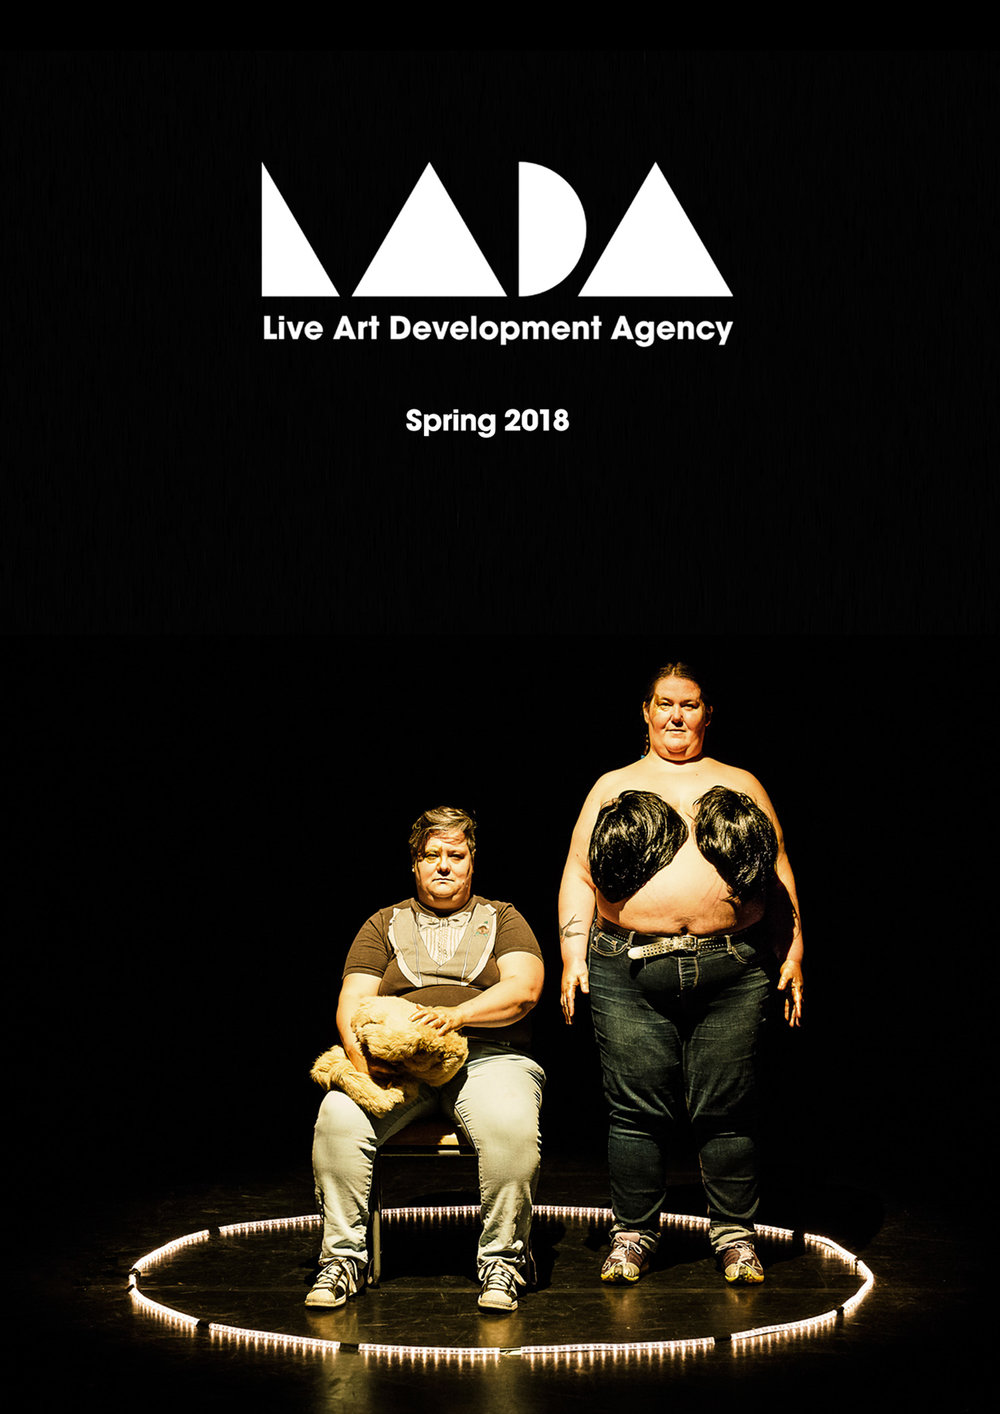 LADA | Live Art Development Agency   Swagga | Projecto O   Poster   London, 2018